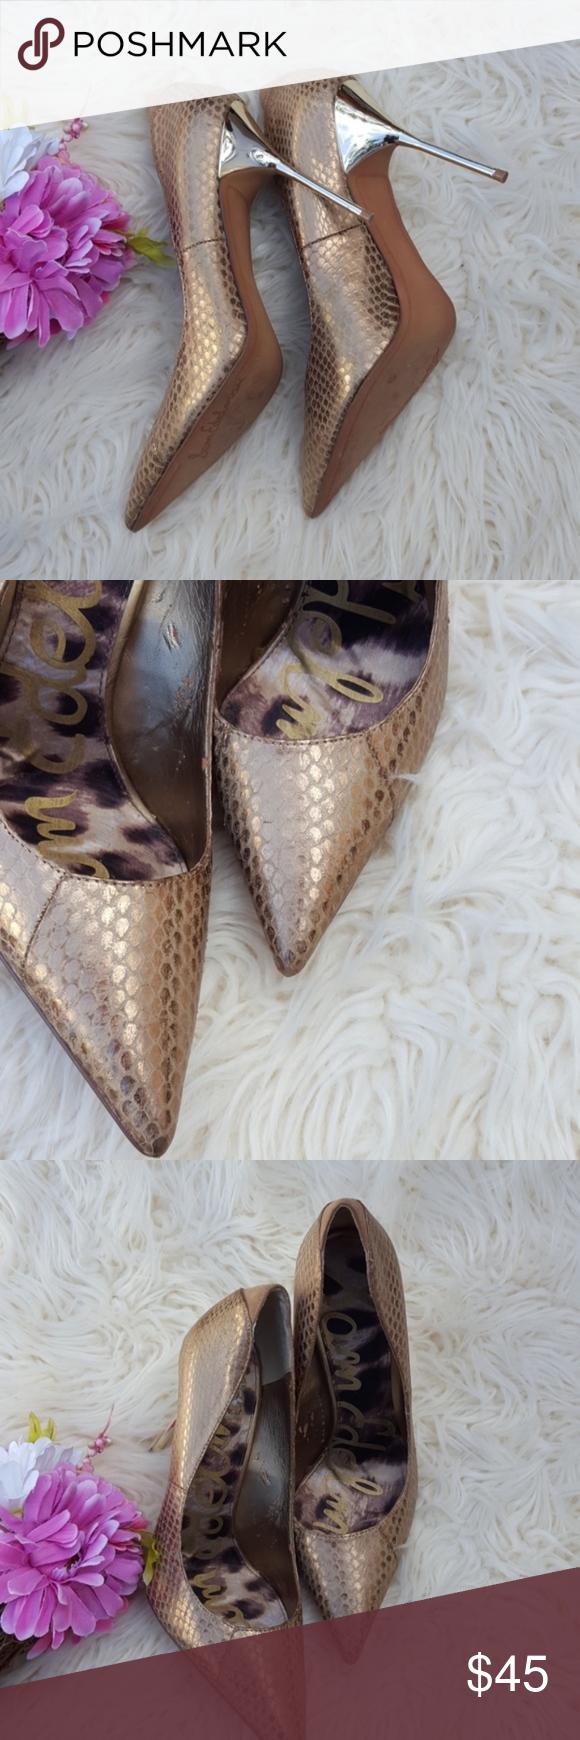 eae5443844988f Sam Edelman Danielle gold Leather heel Sz 10 C10 Sam Edelman Danielle gold  Leather heel Sz 10 Heel Height 4.5